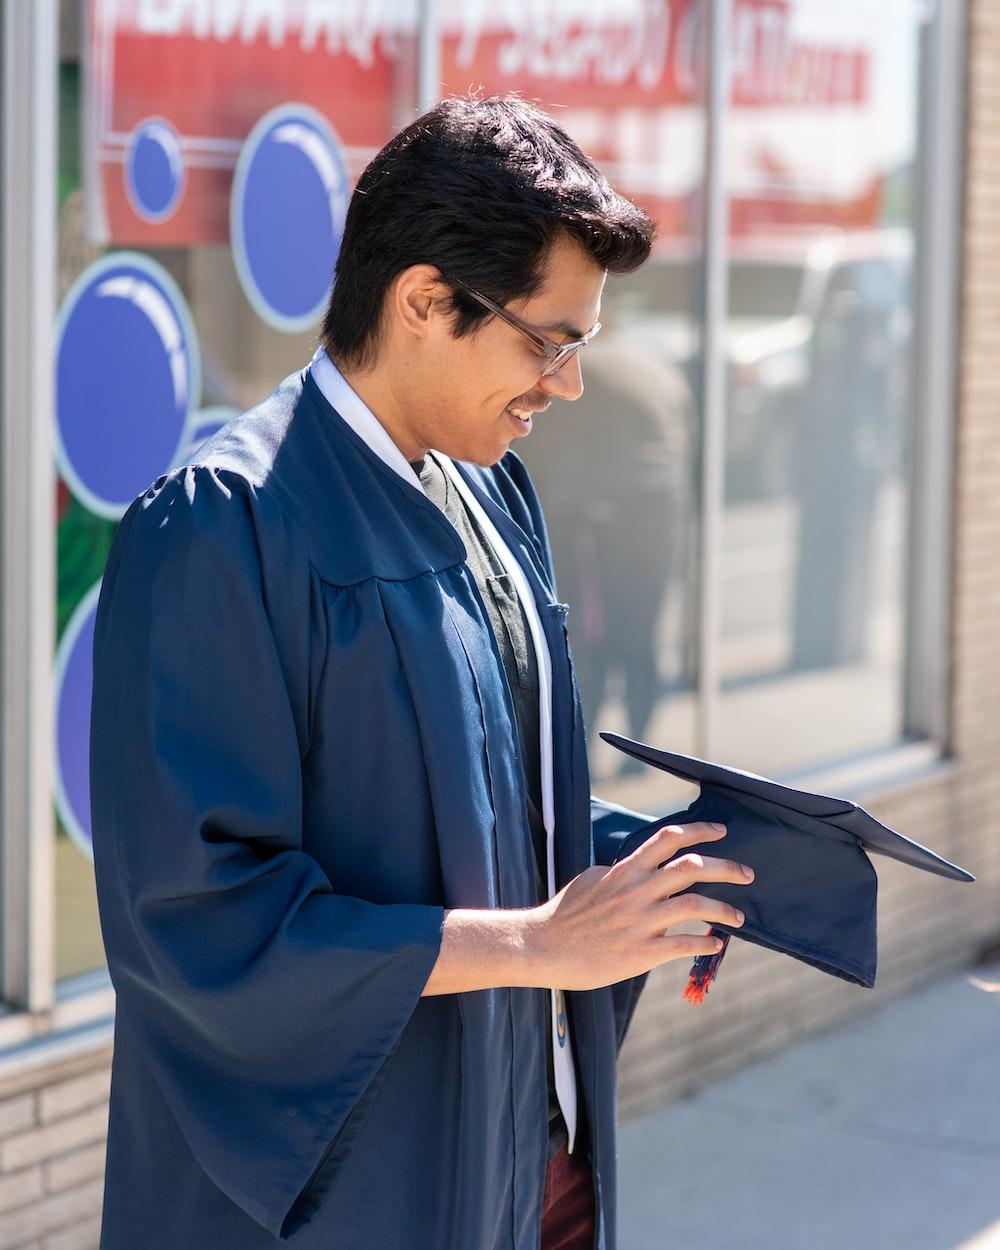 man in blue dress shirt holding black tablet computer